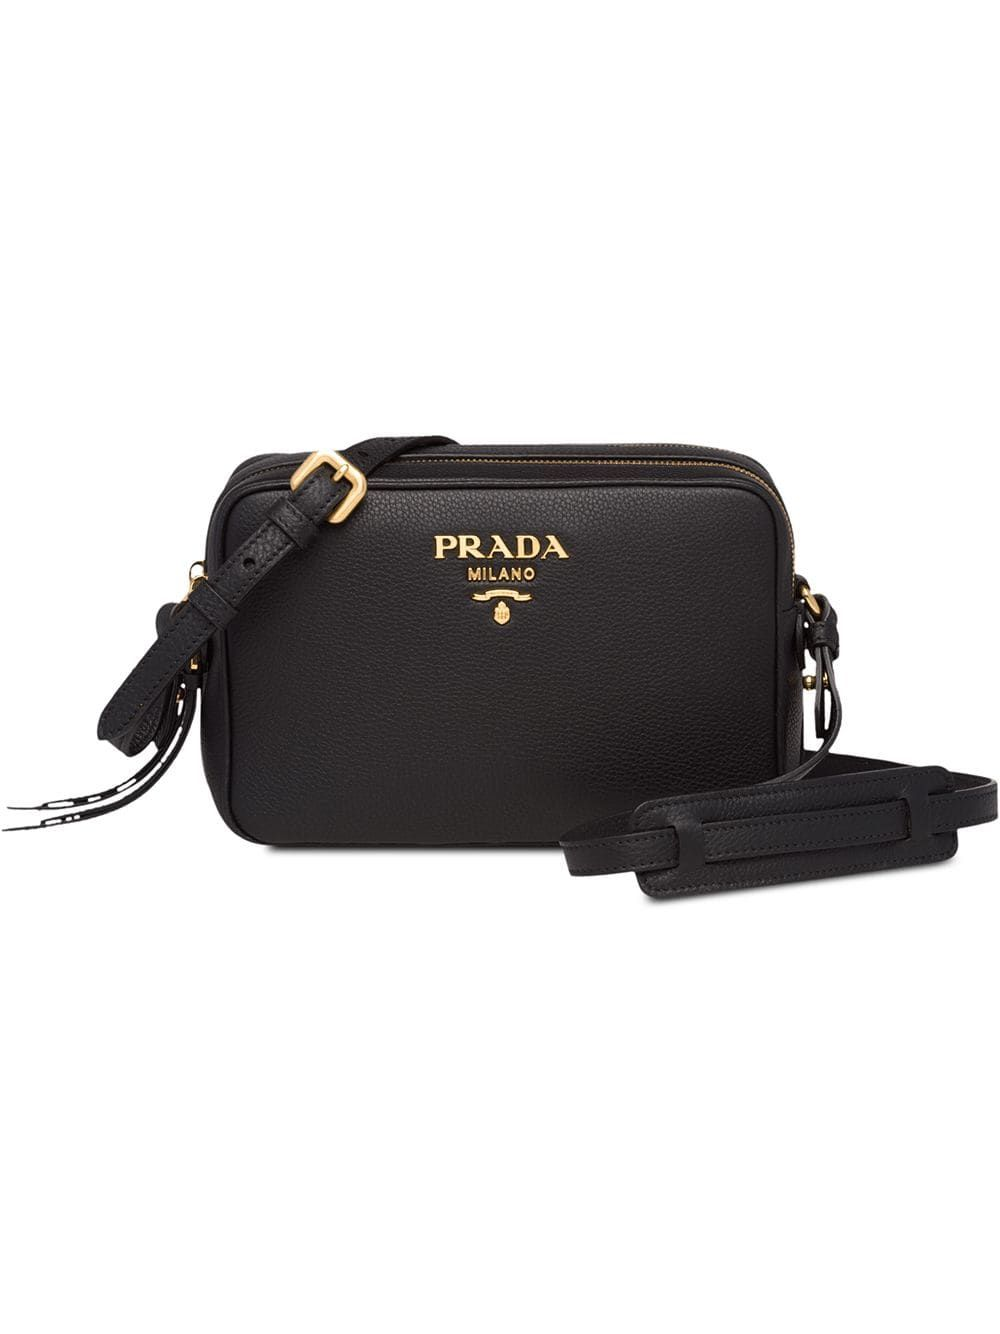 bb821cfab276 PRADA PRADA BLACK LOGO LEATHER SHOULDER BAG. #prada #bags #shoulder bags # leather